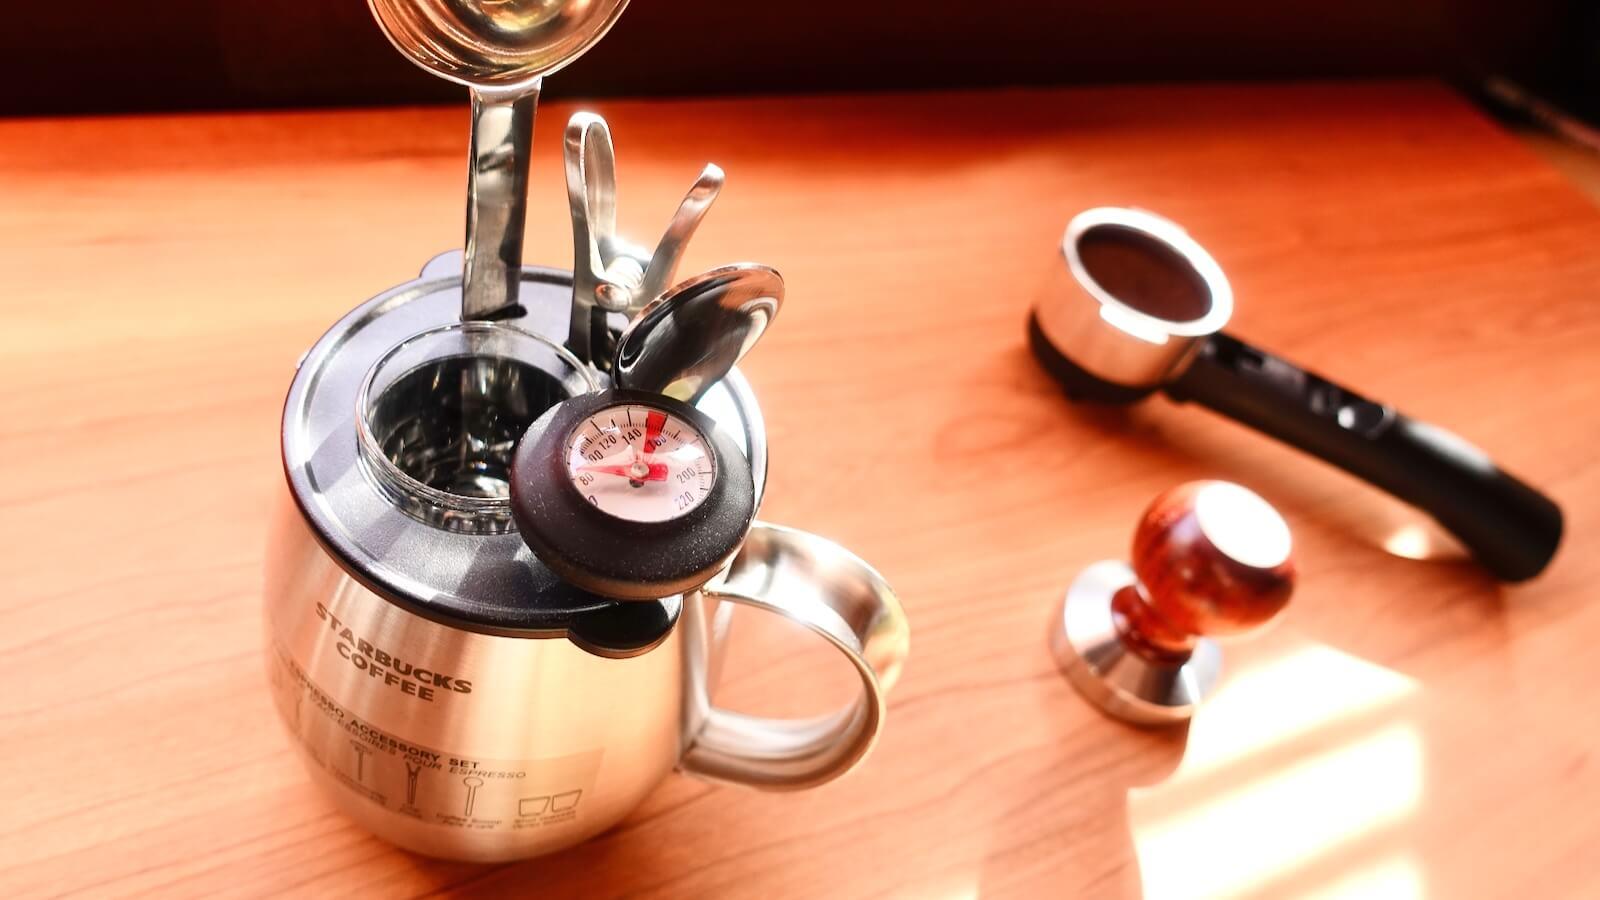 Starbucks Espresso Kit